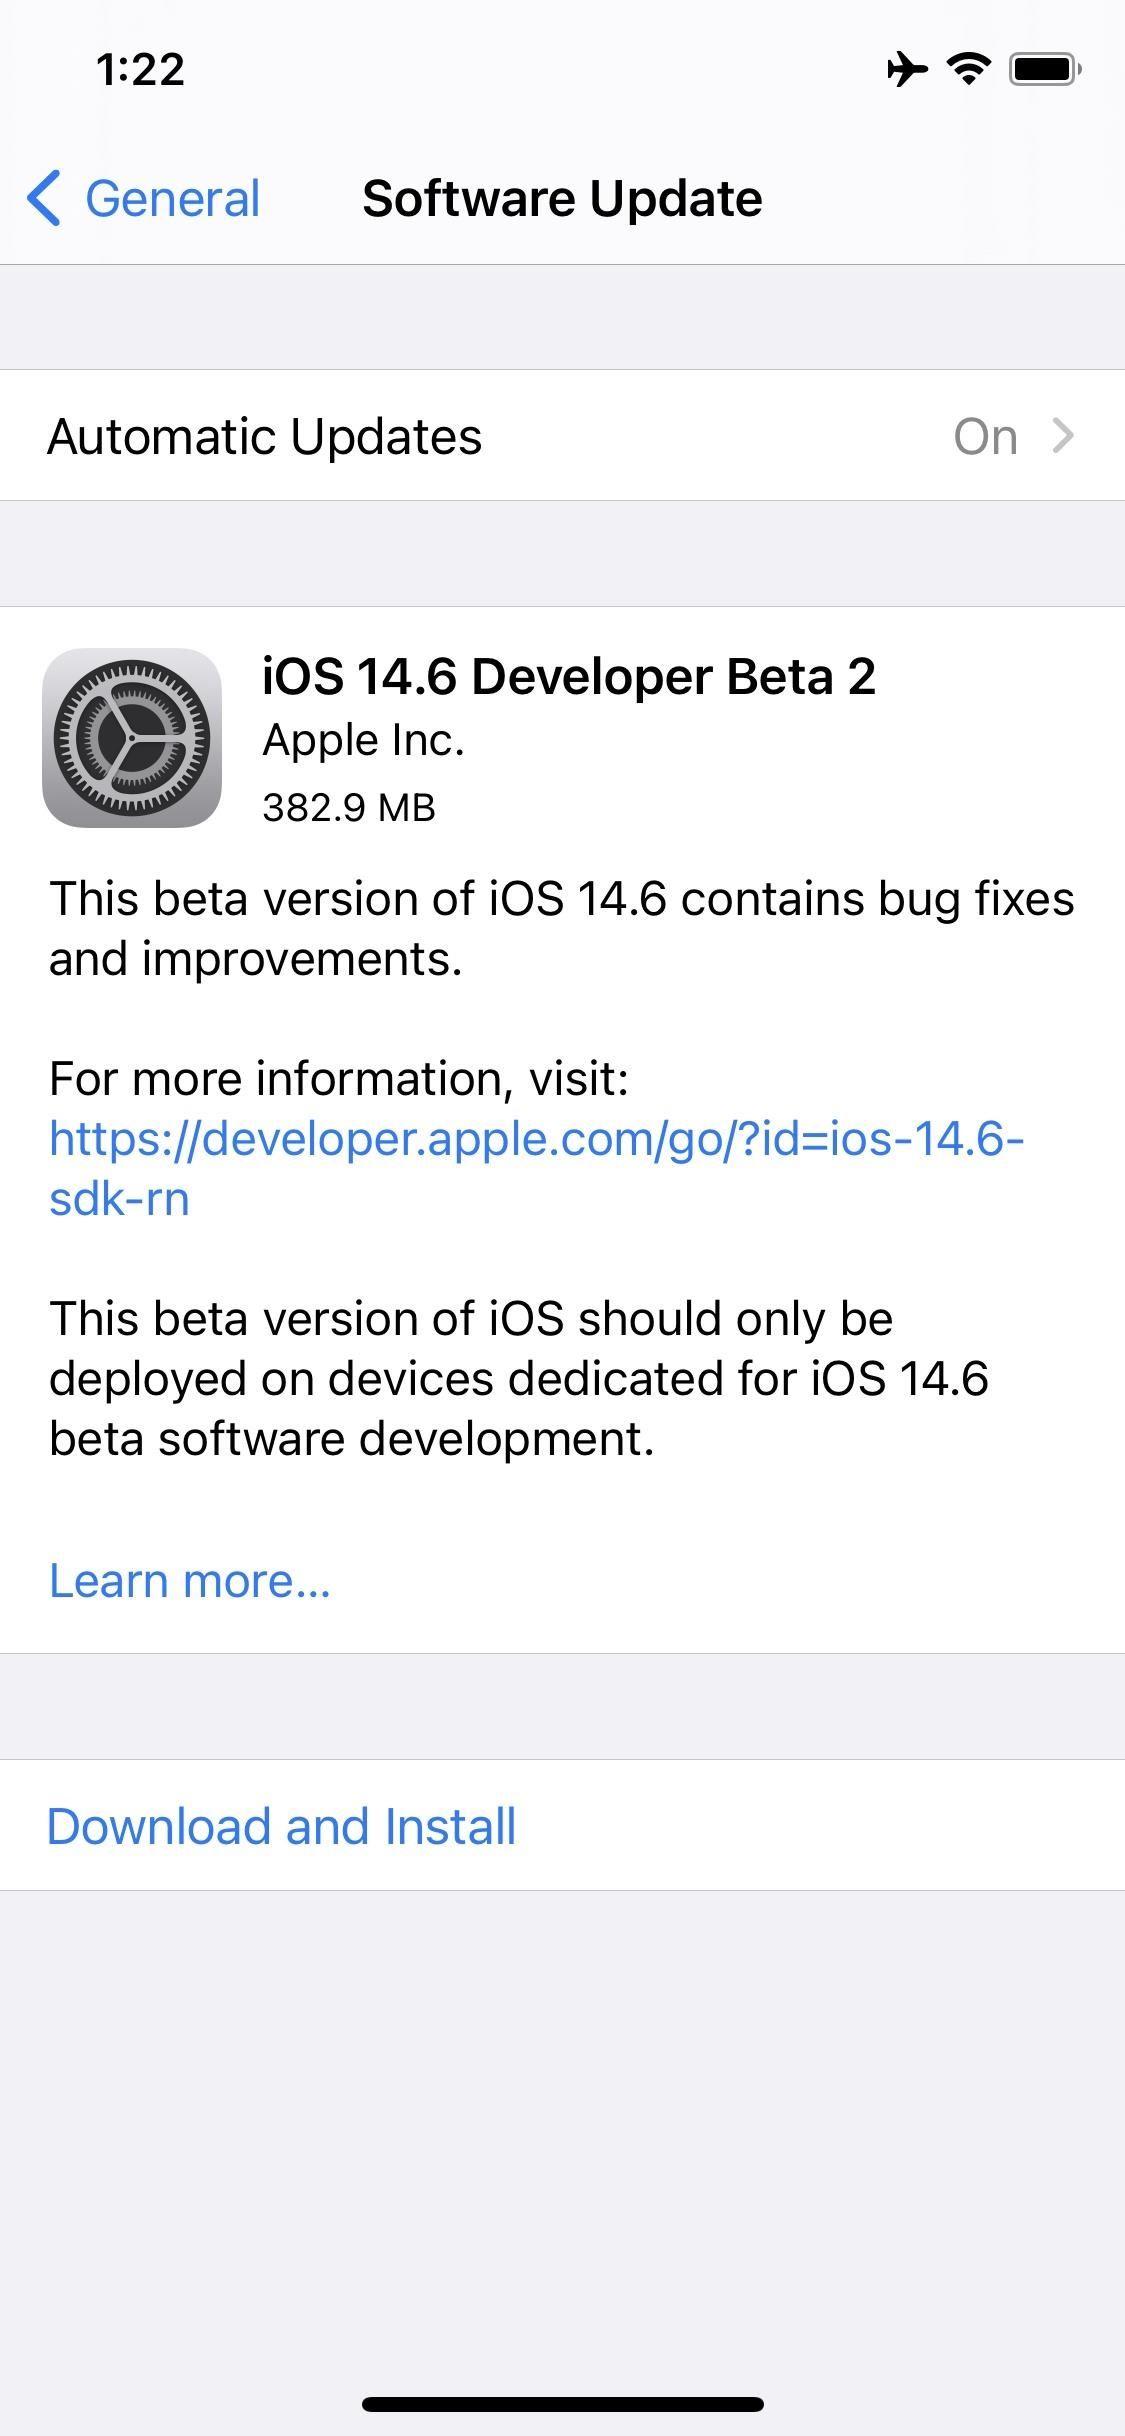 Apple Releases iOS 14.6 Developer Beta 2 for iPhone